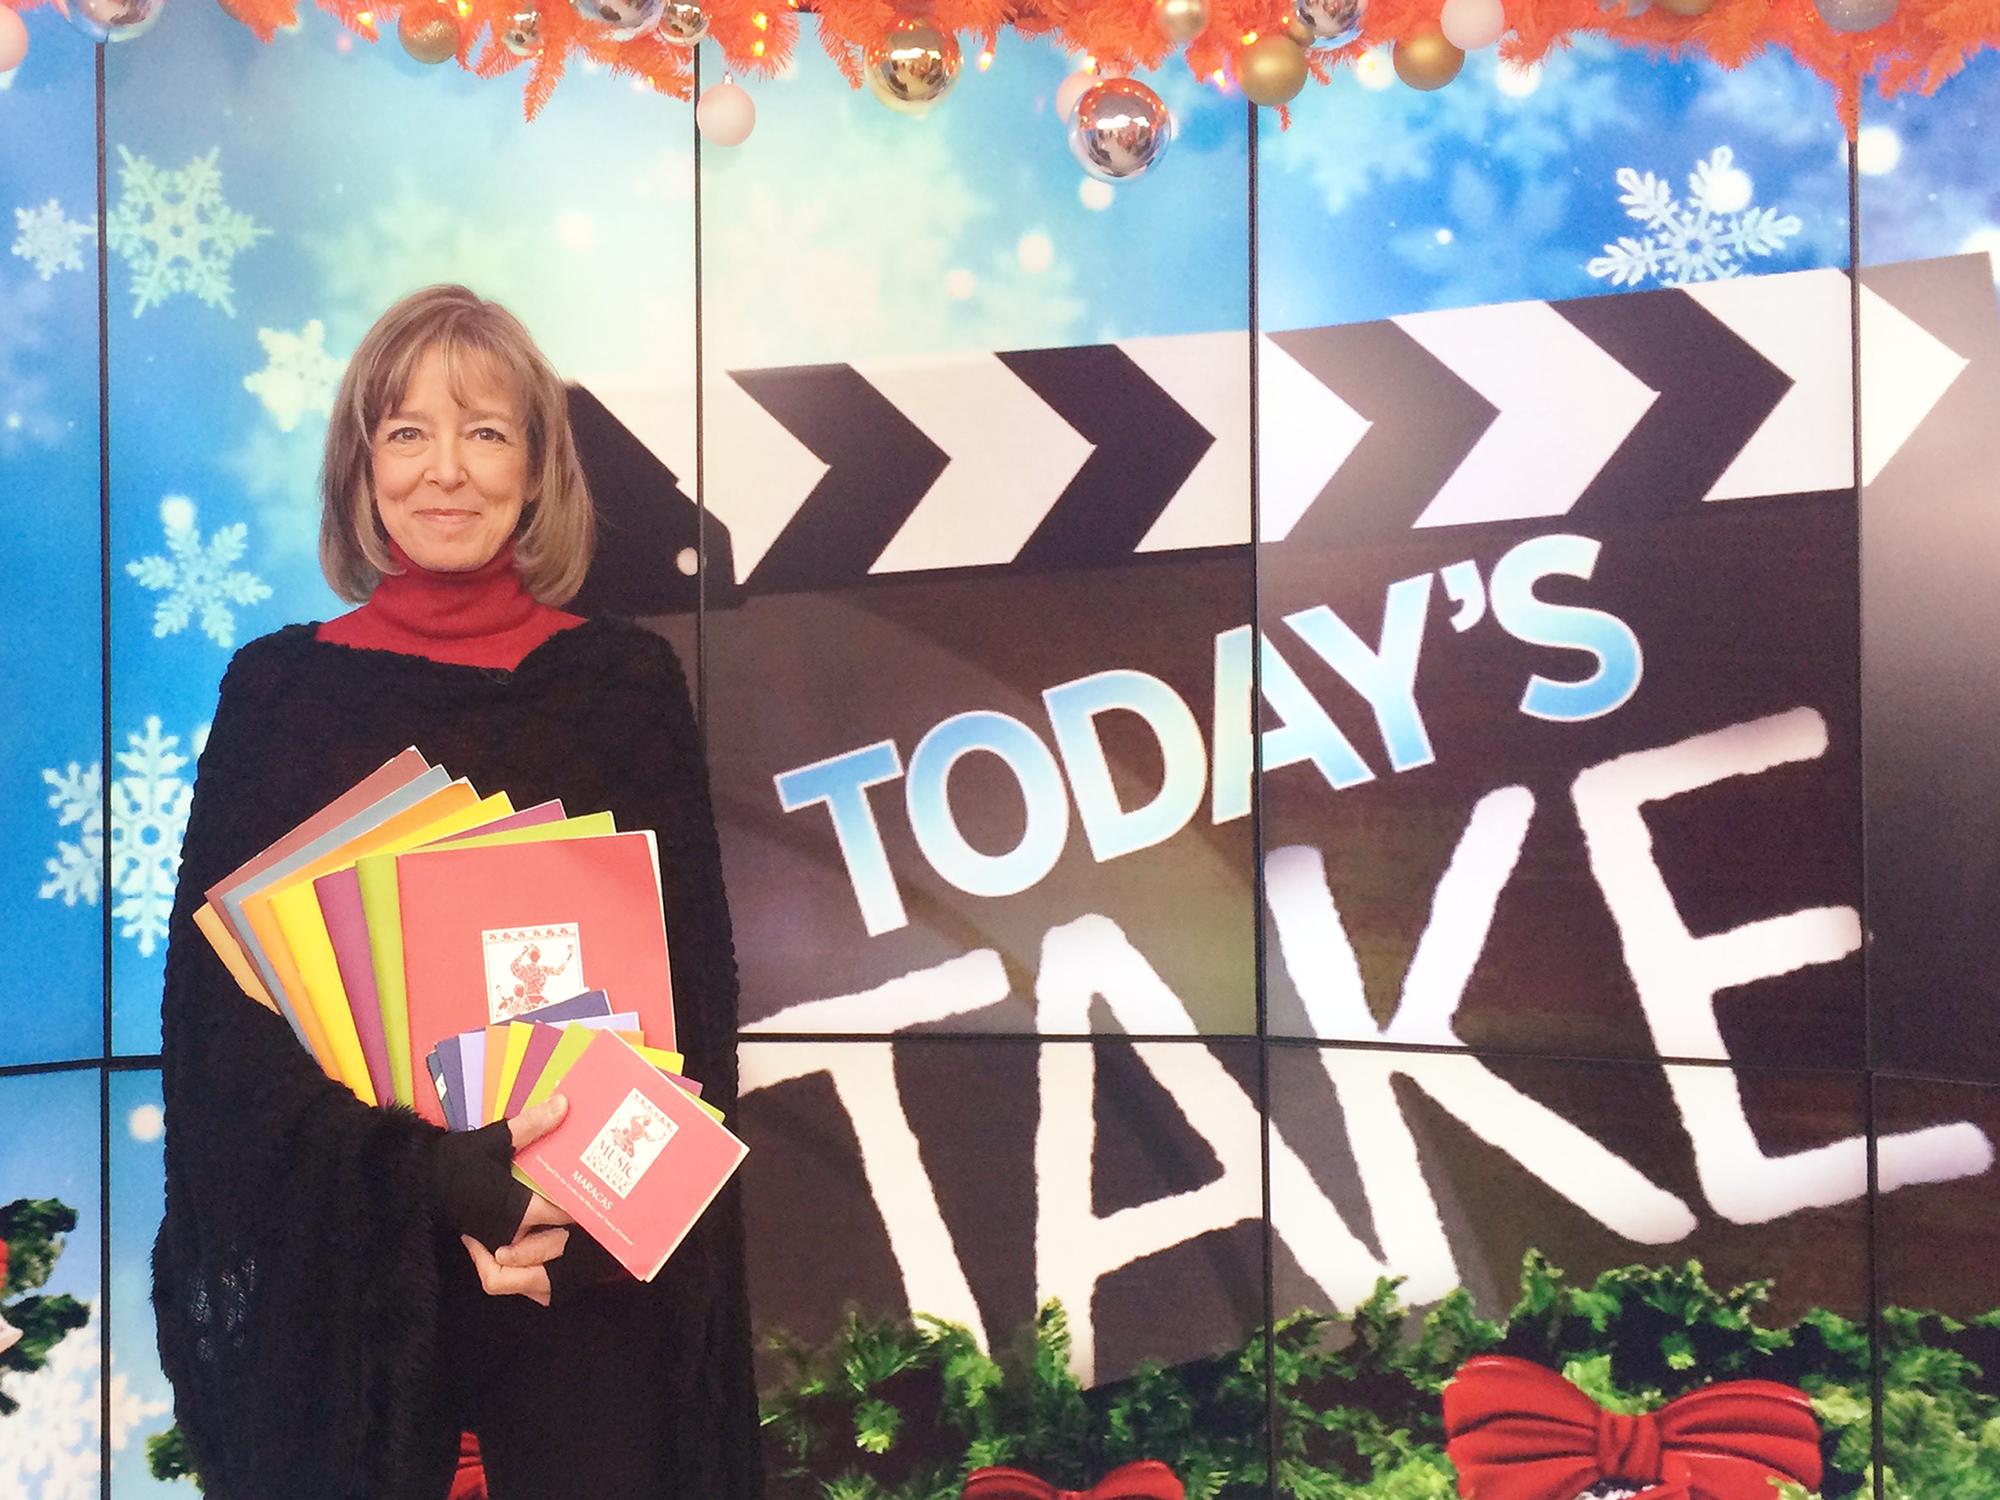 Susan Darrow on NBC's TODAY Show